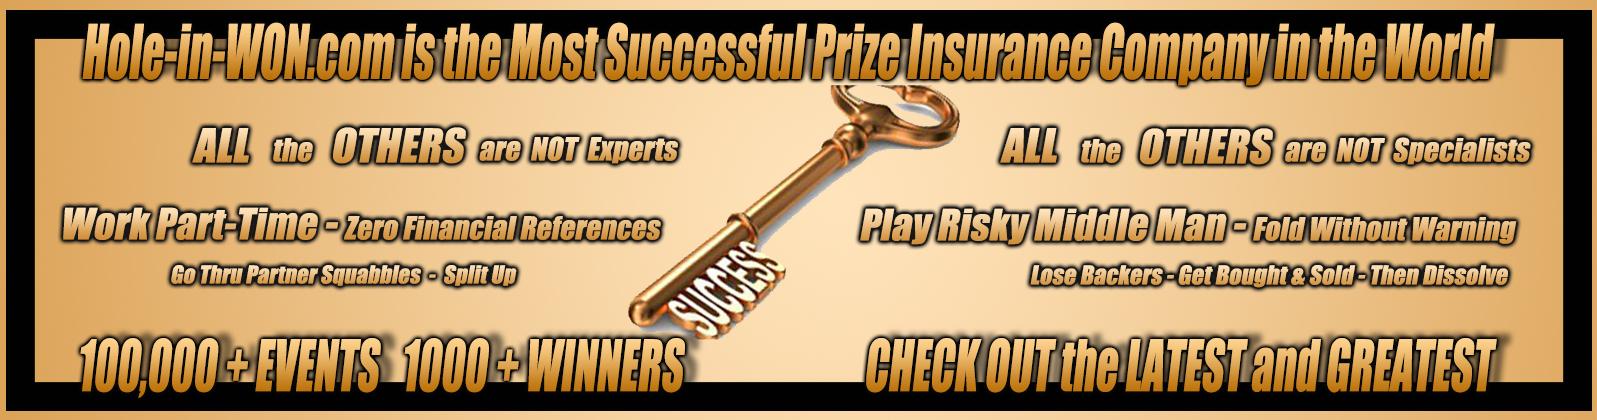 Success Key Golf Insurance Hole-in-WON